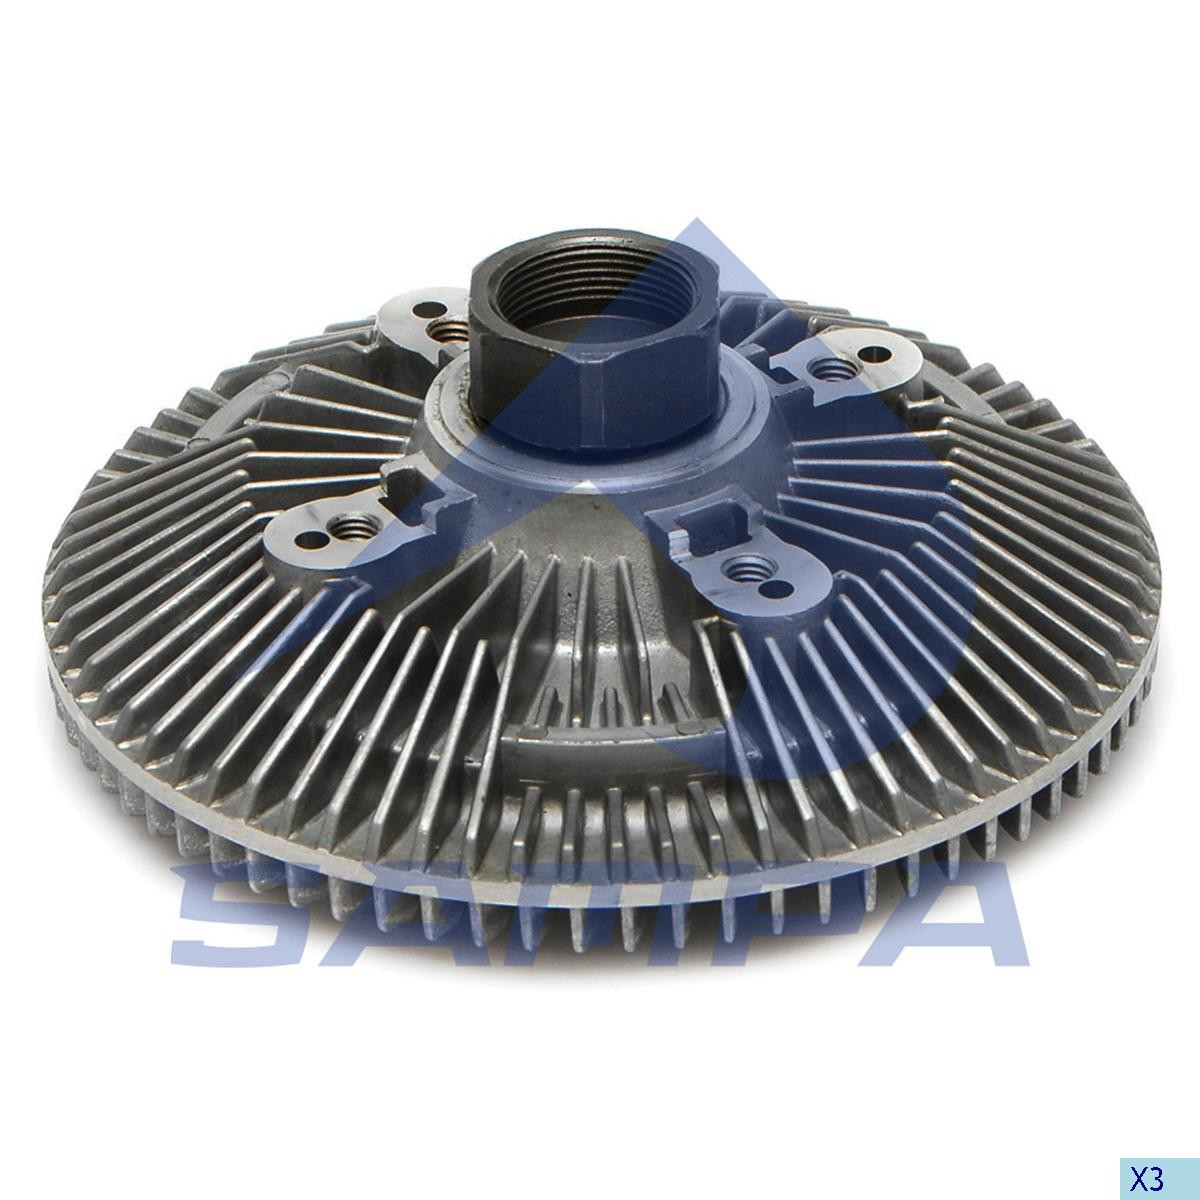 Cupla ventilator radiator Renault Mascot photo